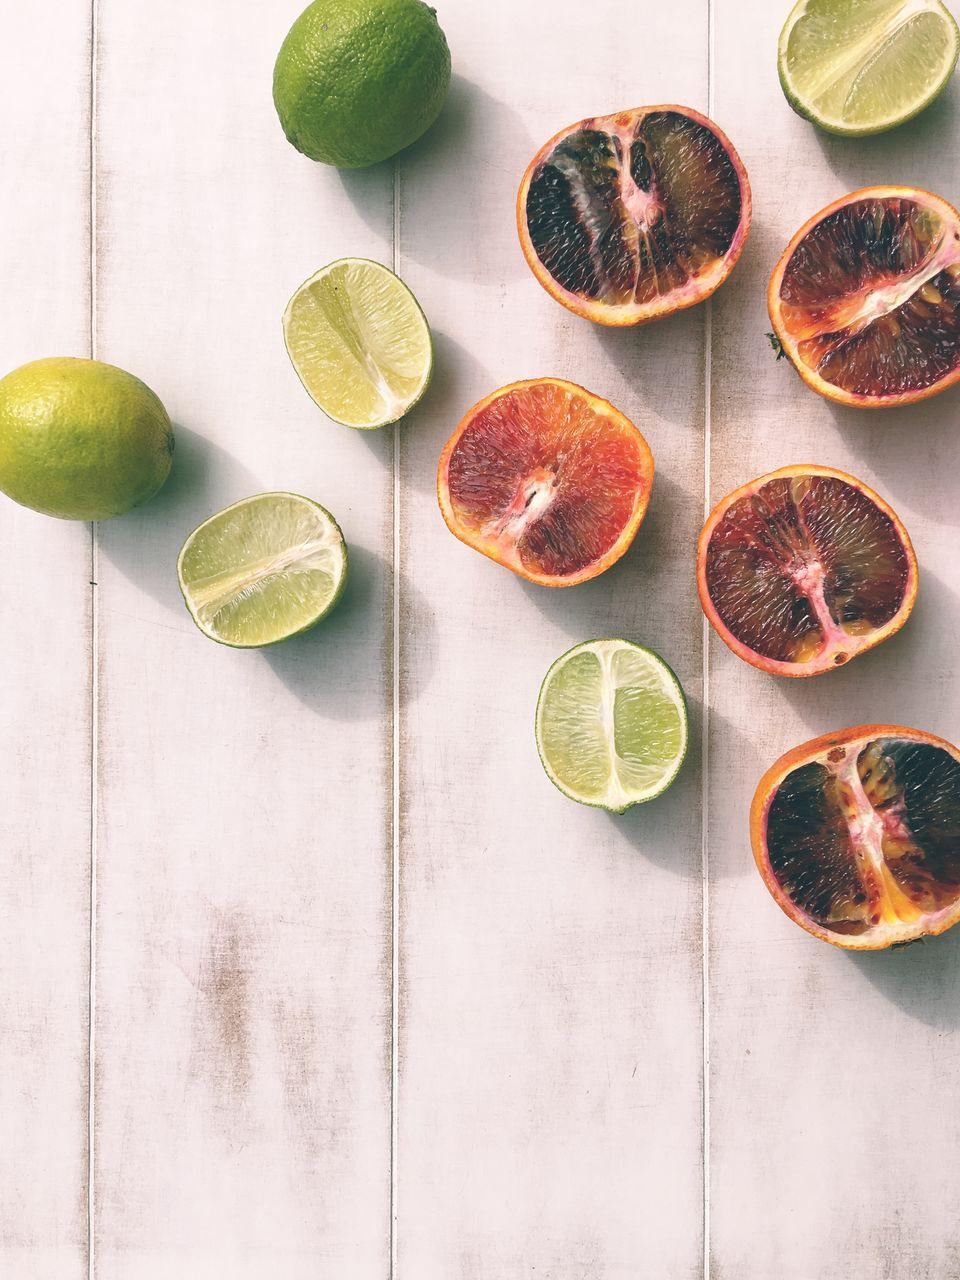 fruit, citrus fruit, cross section, lemon, healthy eating, slice, freshness, halved, lime, food and drink, still life, grapefruit, juicer, no people, indoors, food, blood orange, high angle view, table, studio shot, pomegranate, drink, day, sour taste, close-up